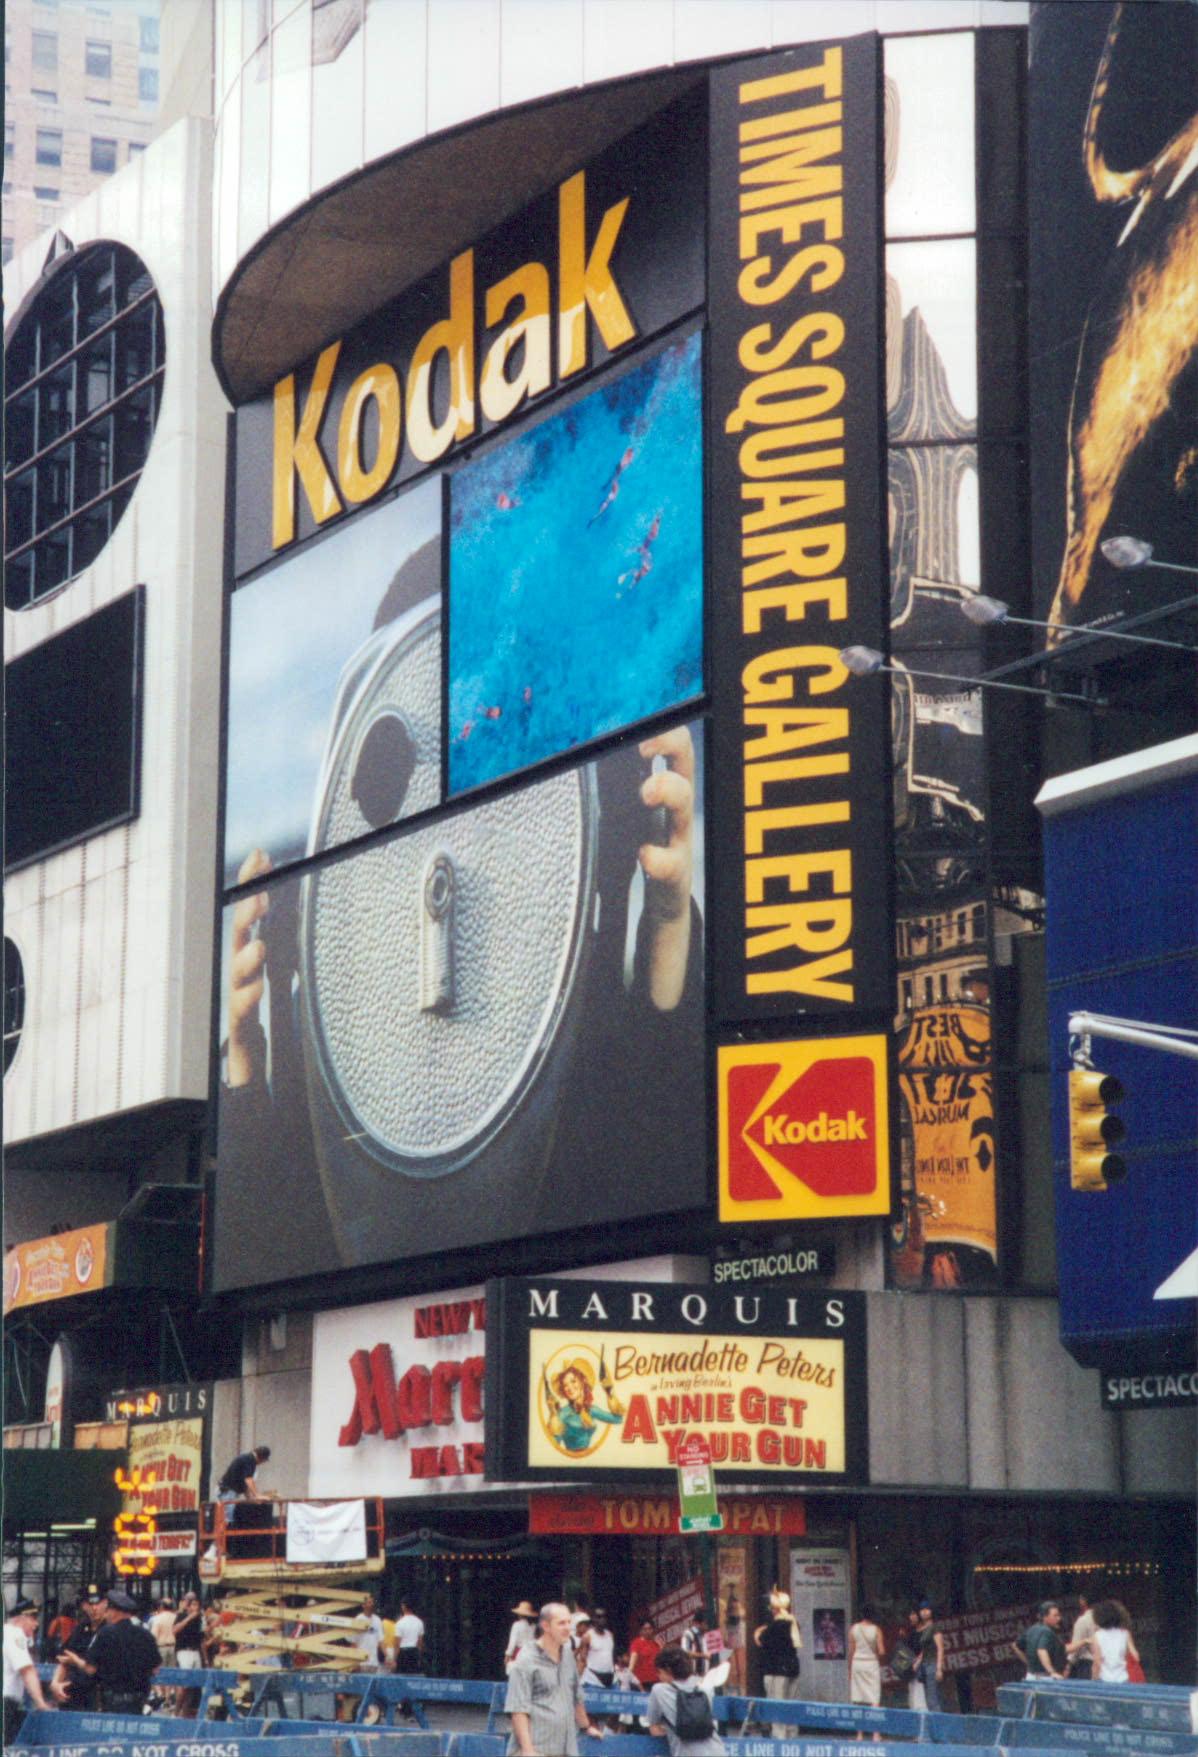 Kodak Times Square Gallery